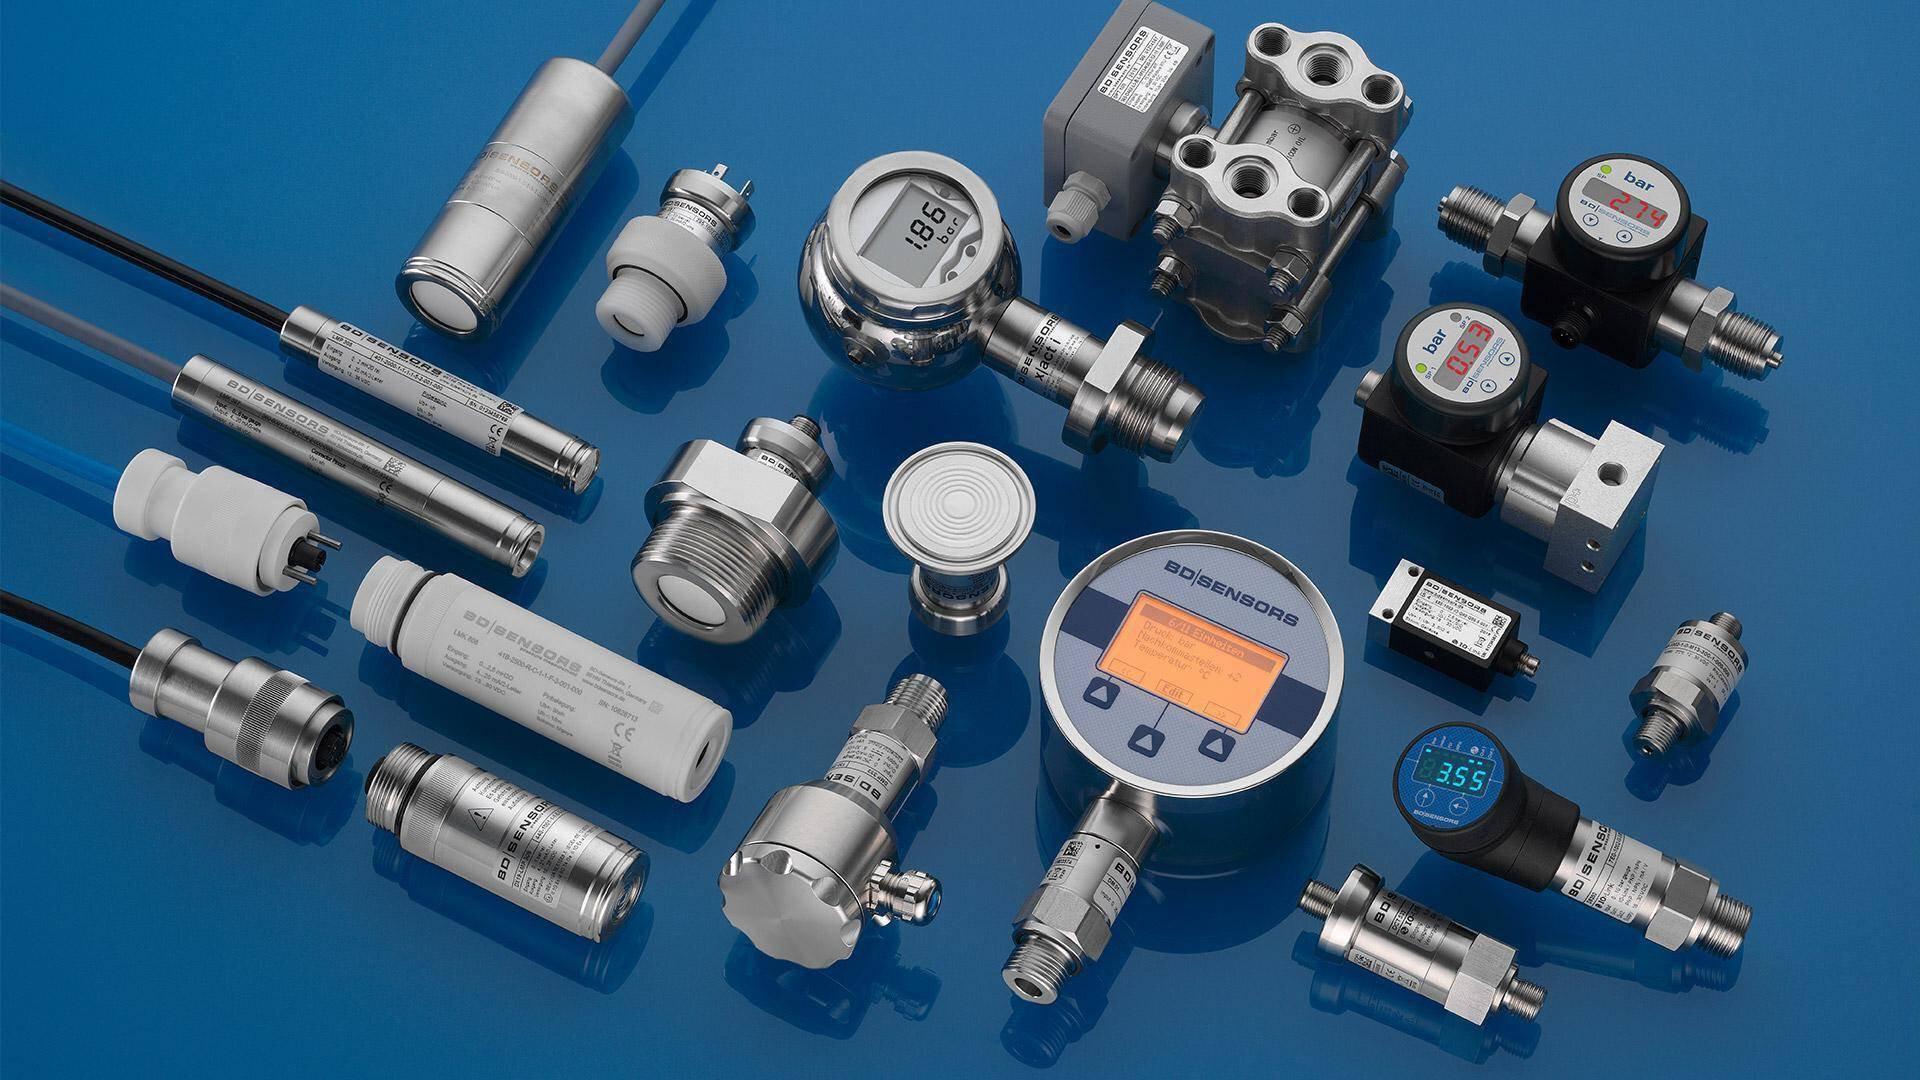 Gallery image 1 - Product range BD|SENSORS for pressure and level measurement: - pressure transmitters - differential pressure transmitters - submersible probes - pressure switches - pressure gauges